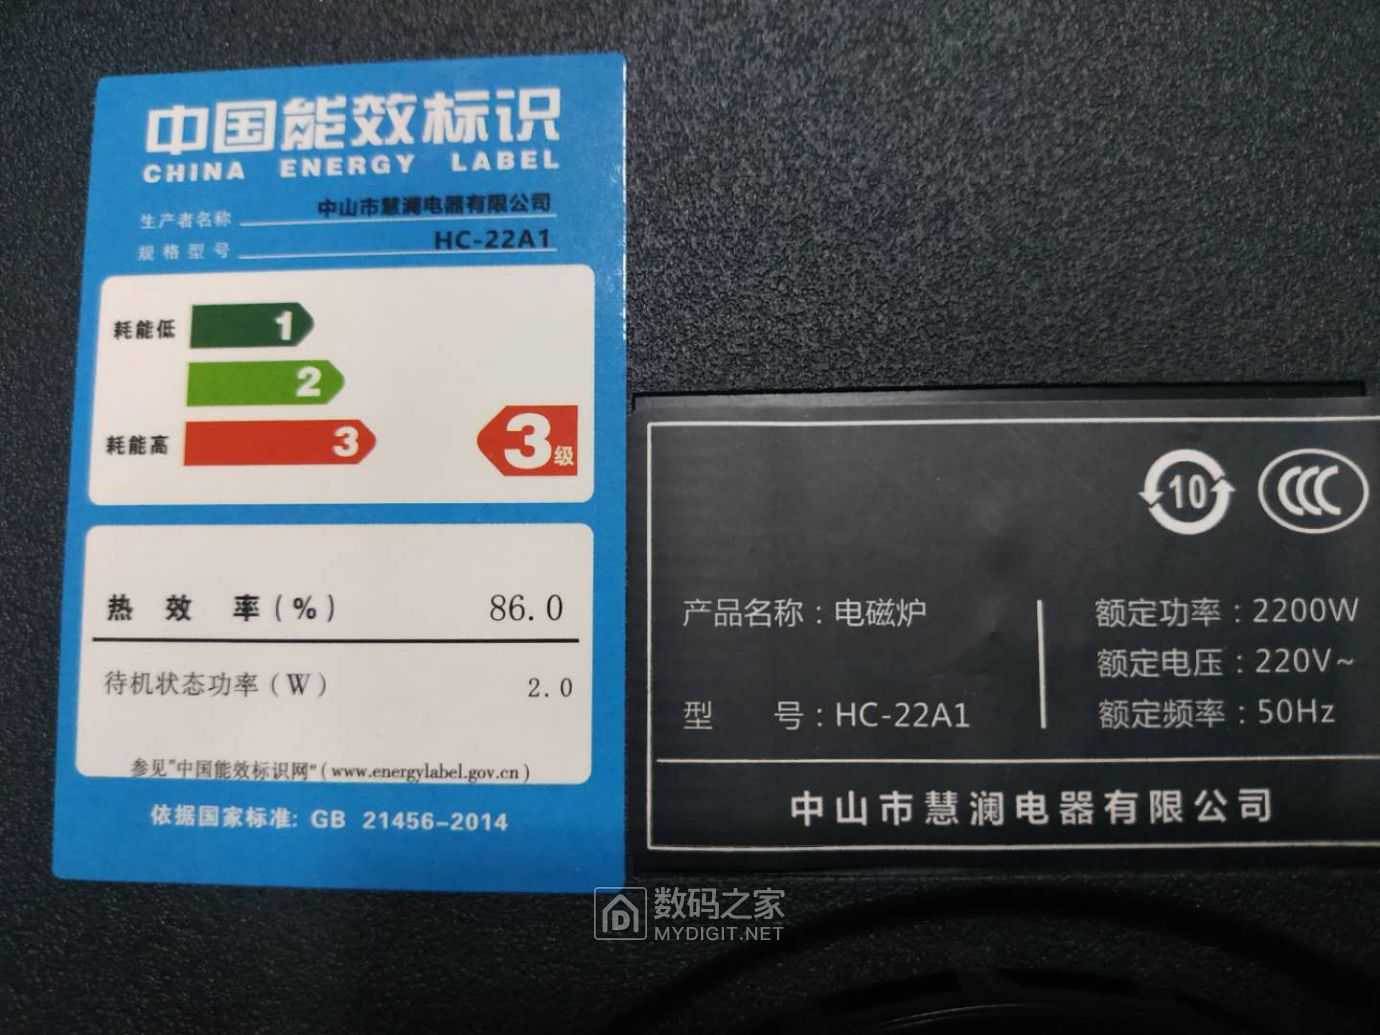 18676f8058bad7d95667ebfdcd6615c.jpg